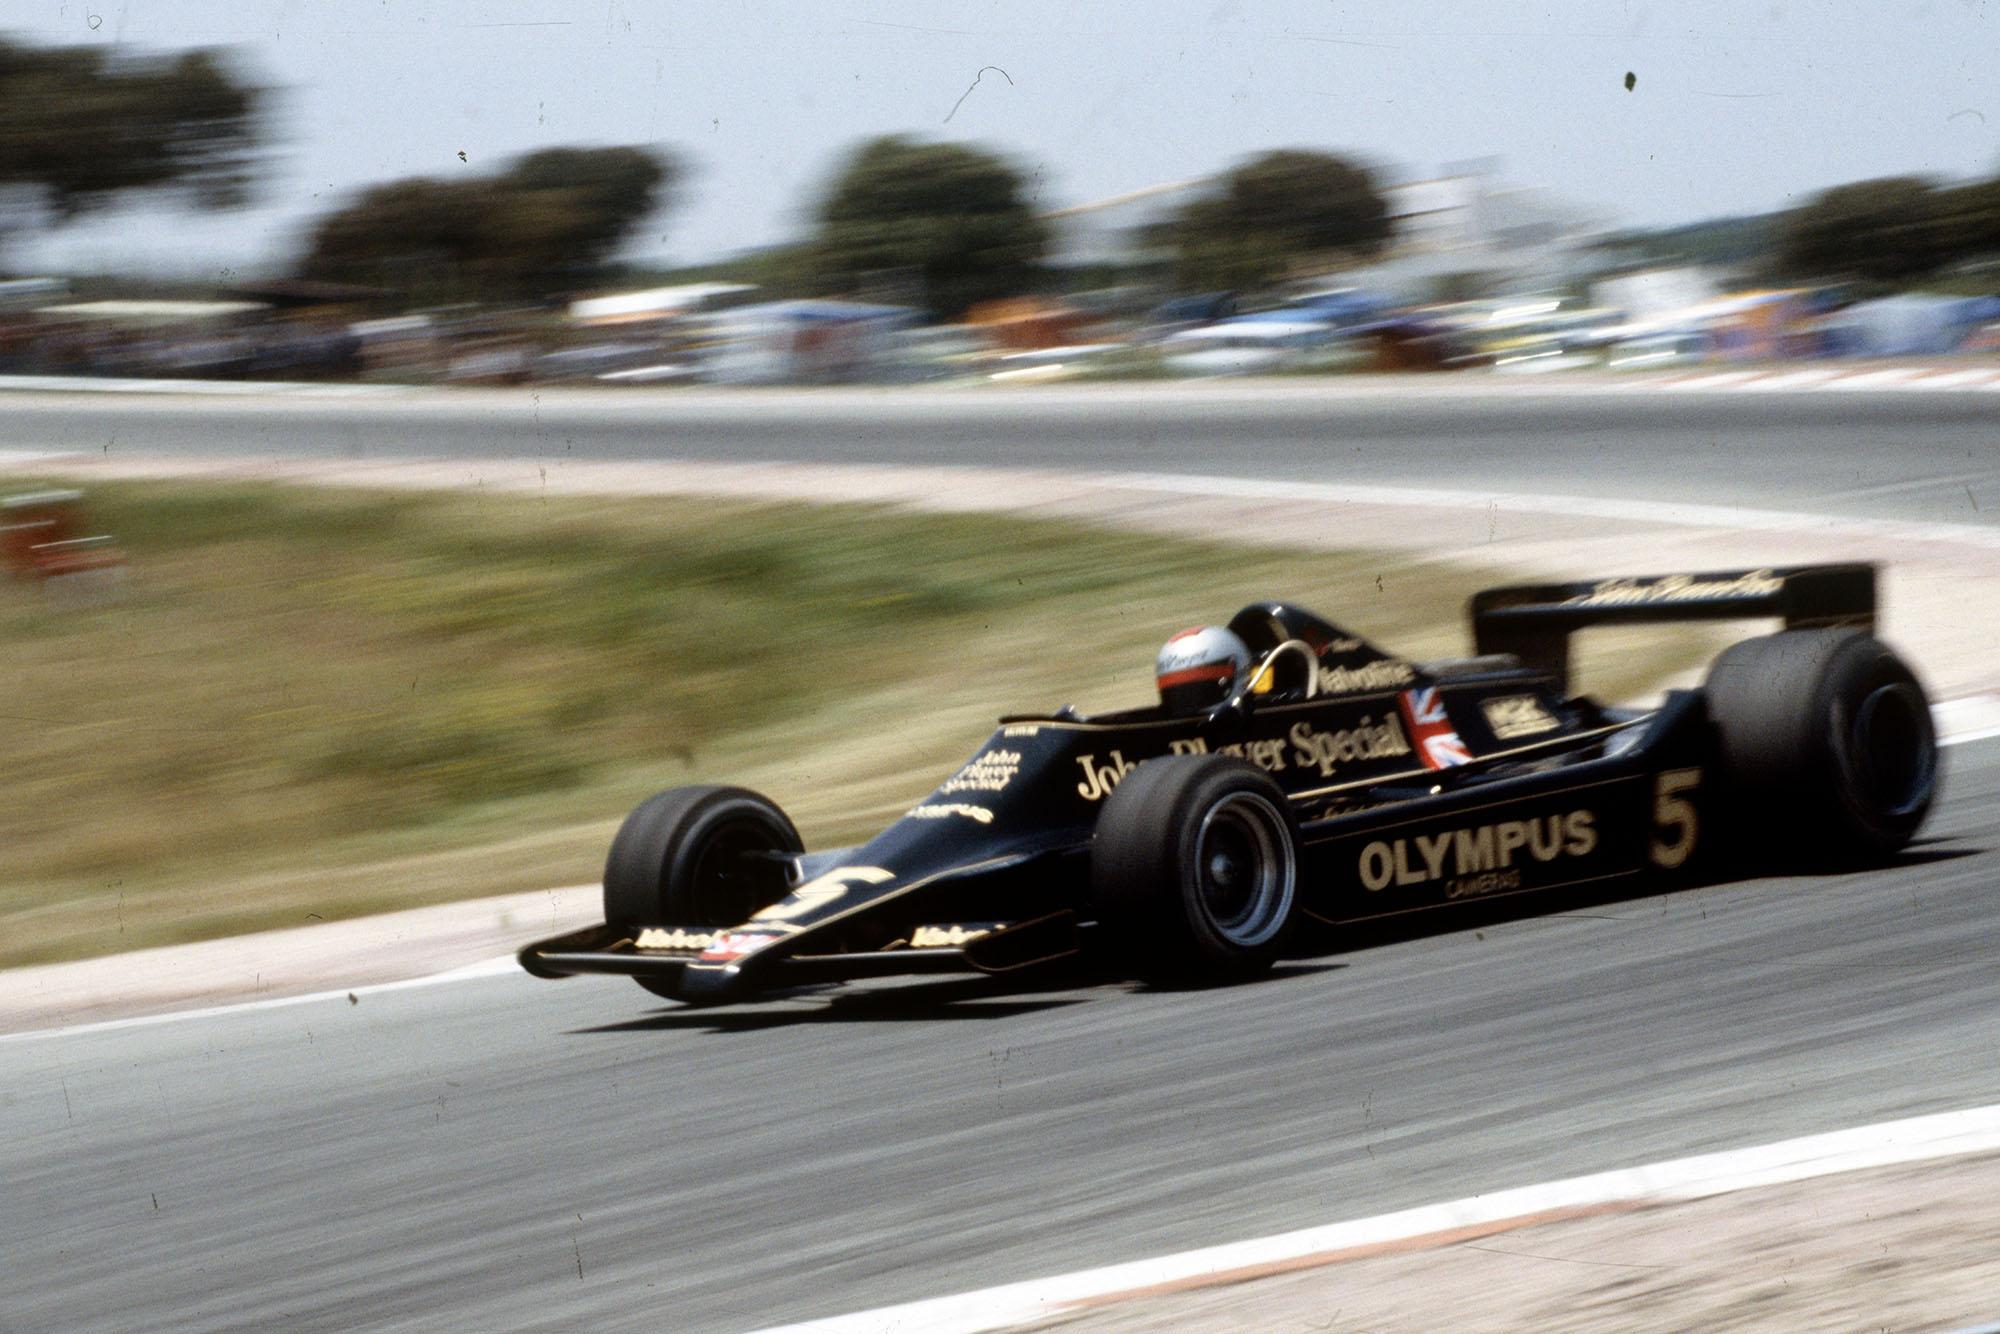 Mario Andretti (Lotus) competing at the 1978 Spanish Grand Prix, Jarama.